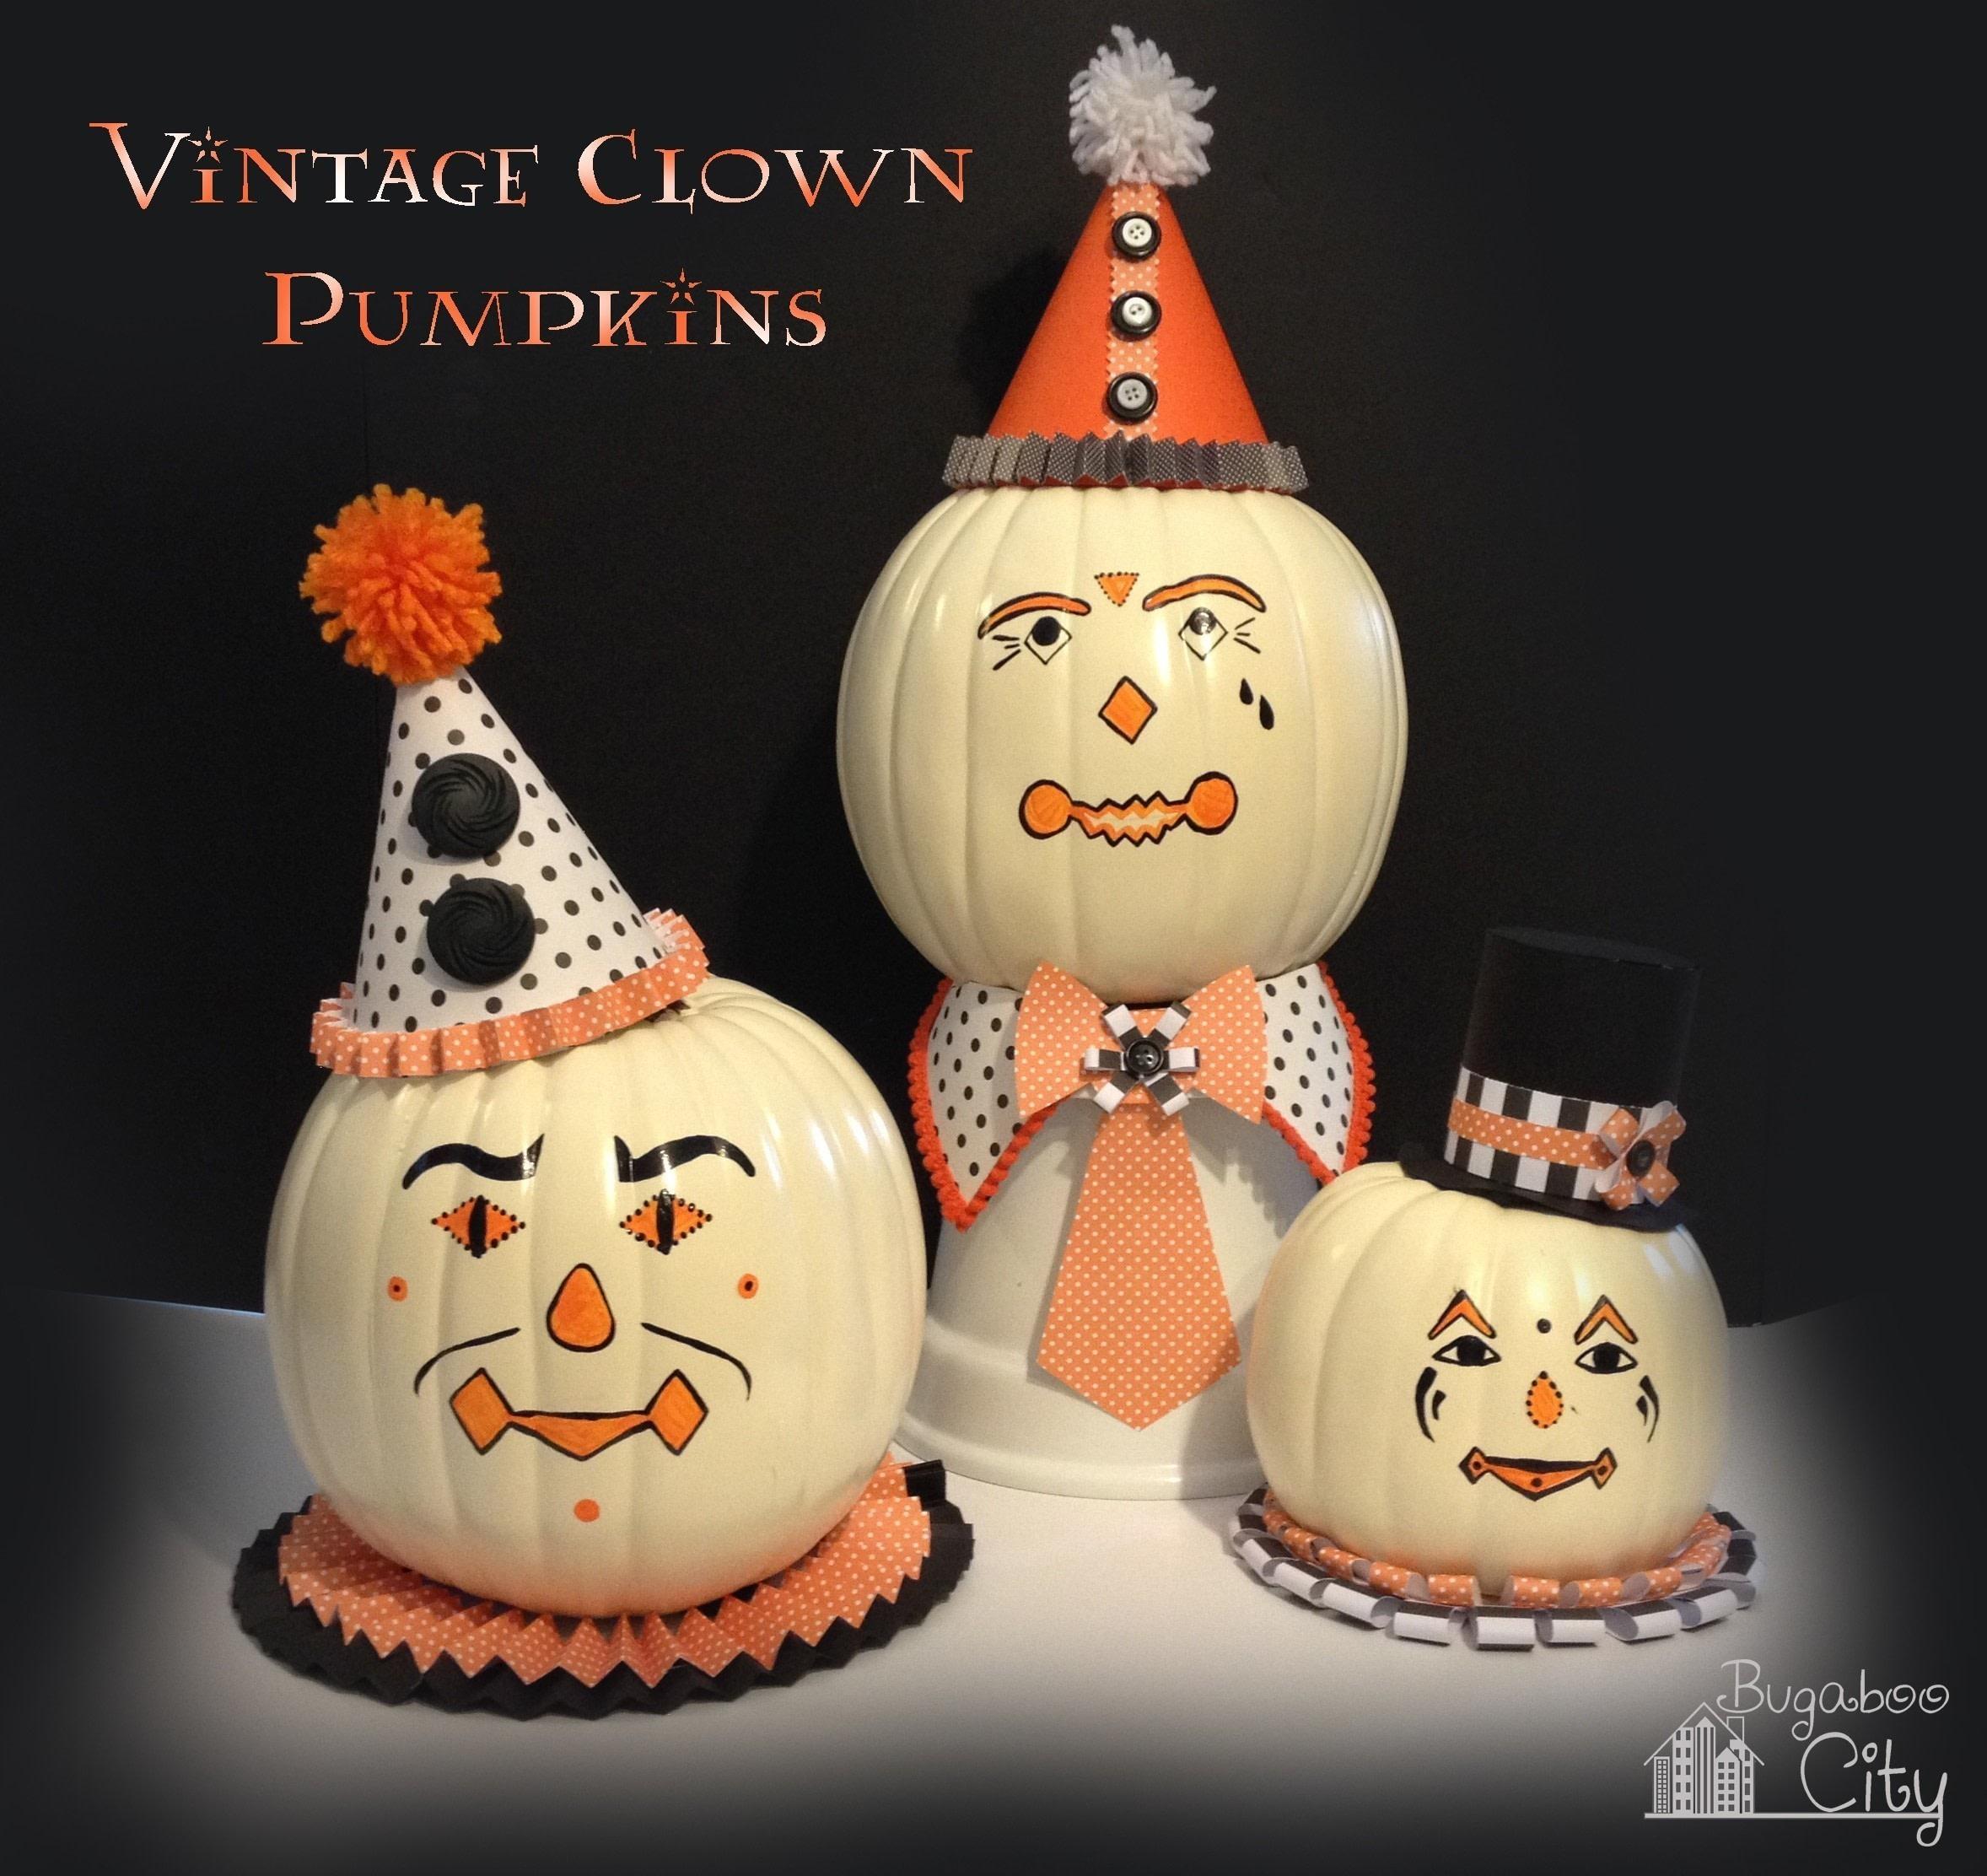 Vintage clown pumpkins how to decorate a pumpkin other for Clown dekoration